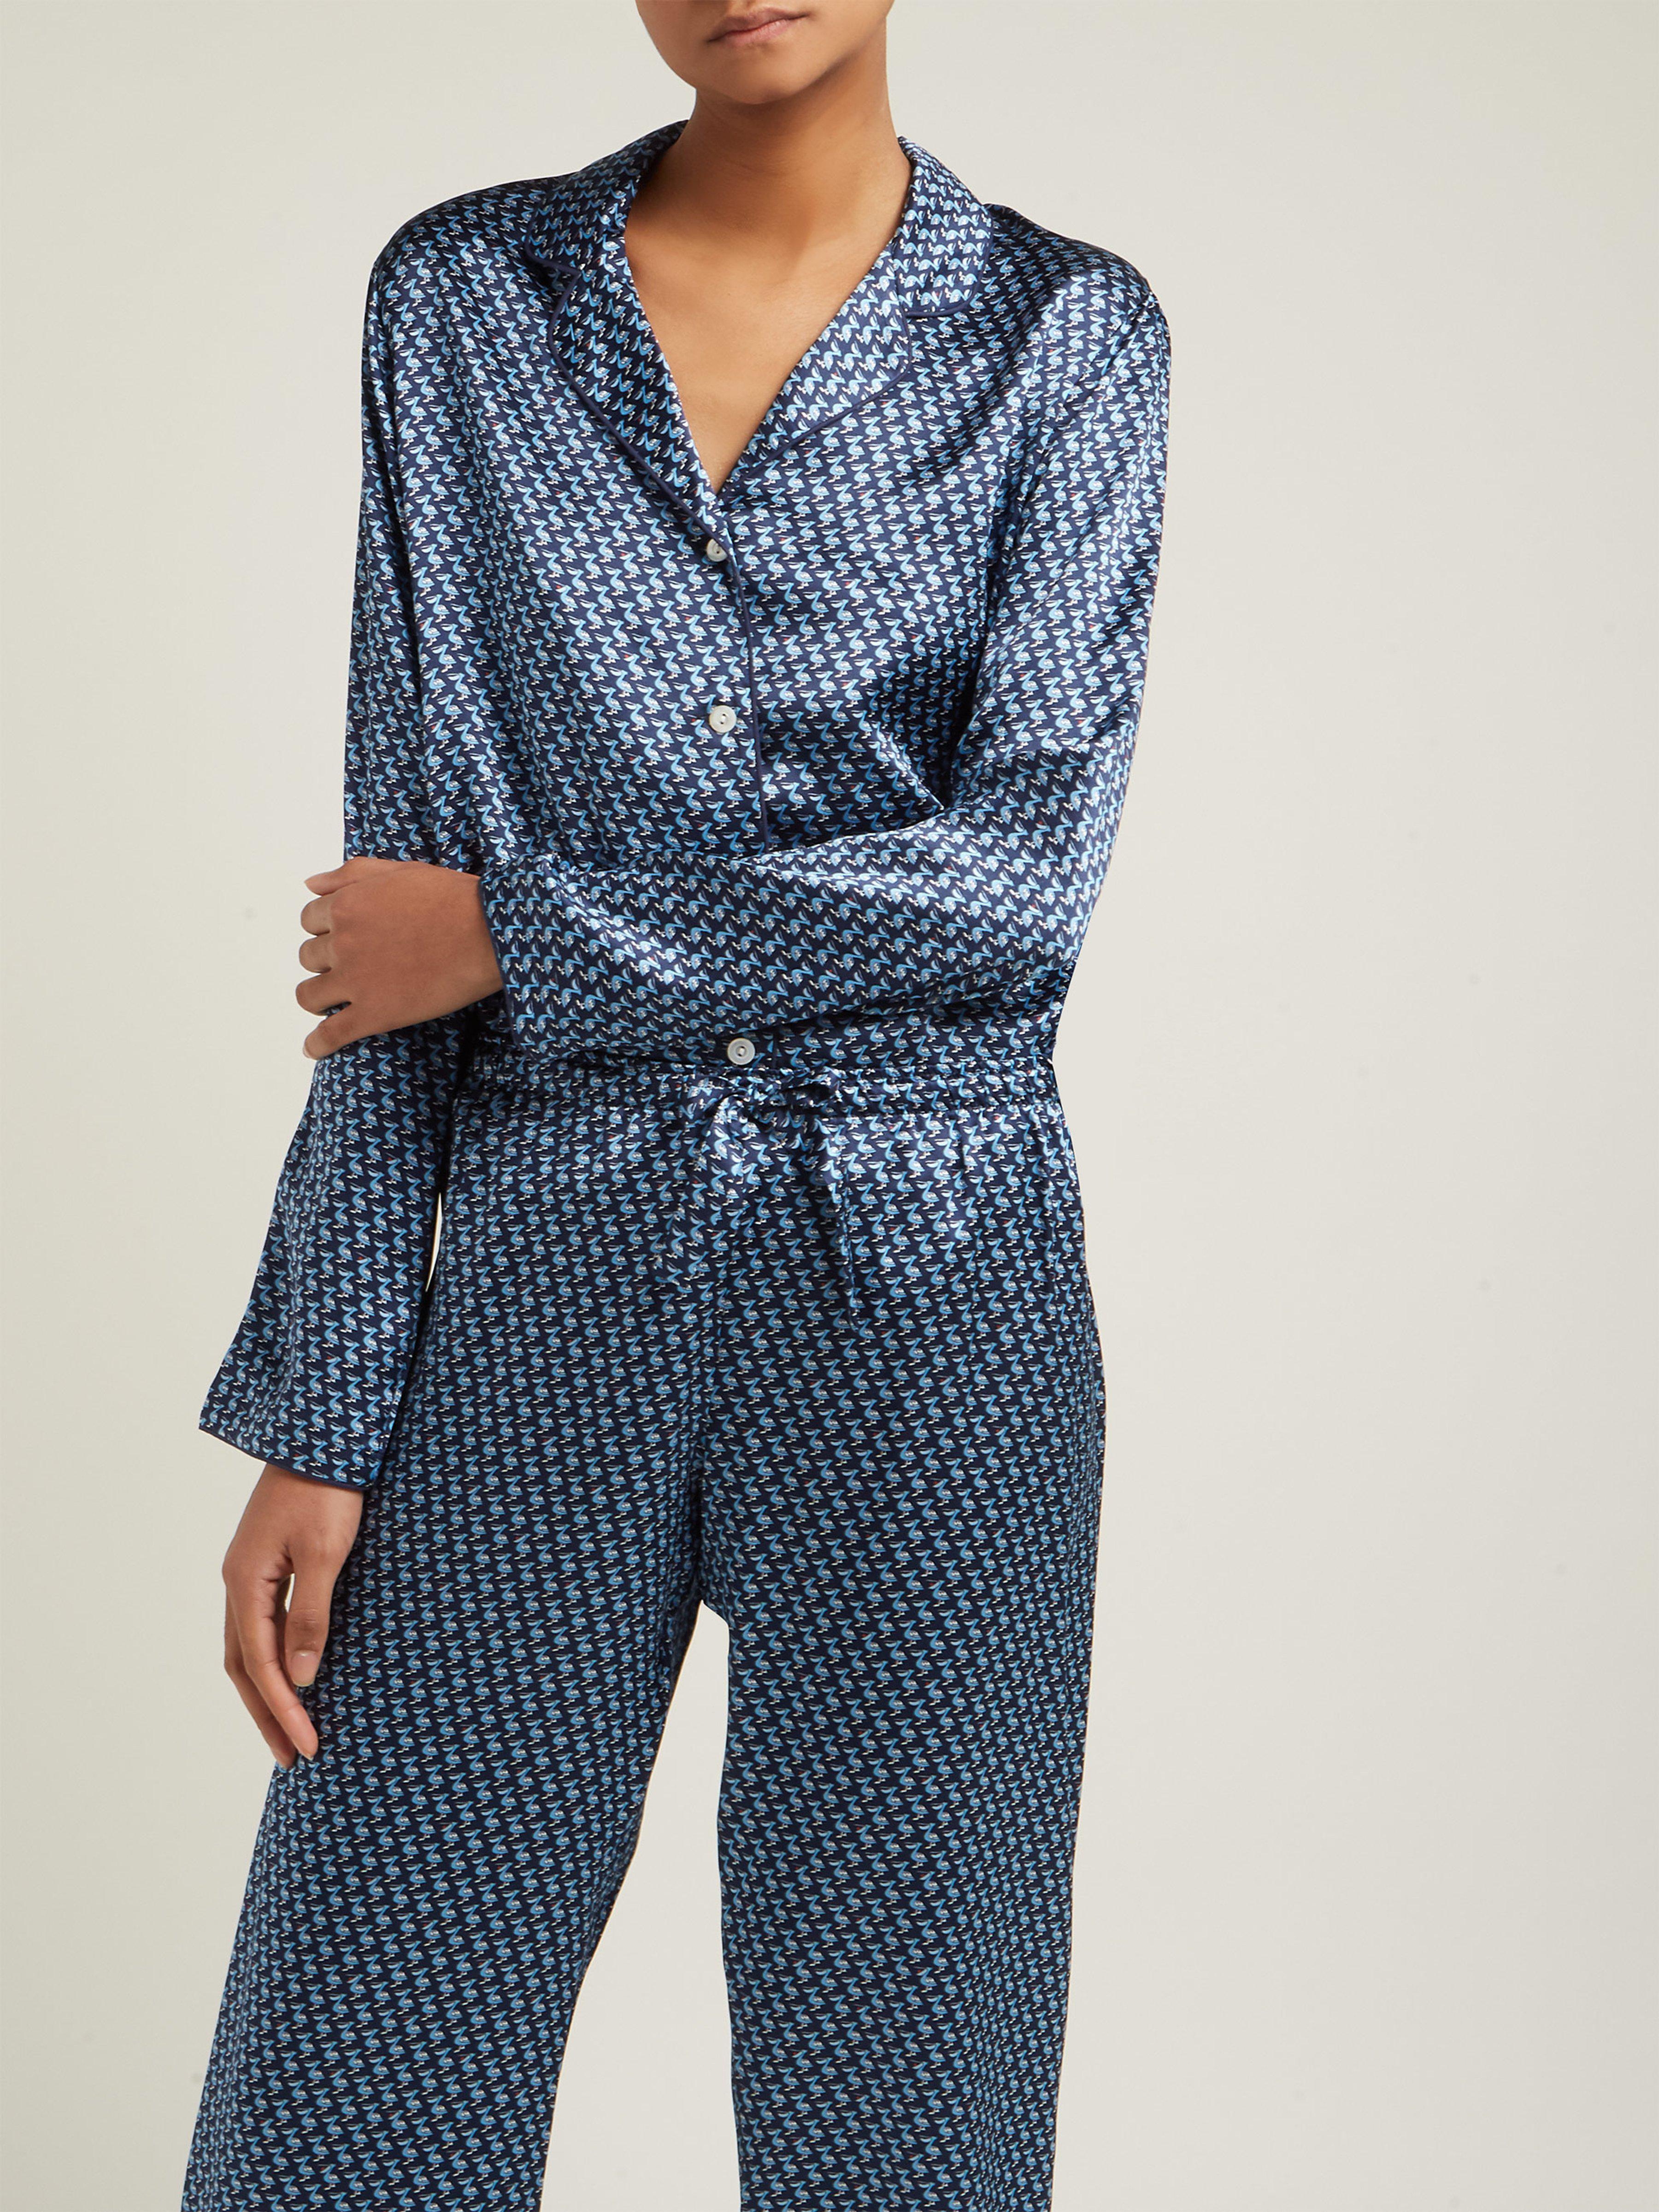 dea1b4c206990 Derek Rose Brindisi 32 Silk Charmeuse Pyjama Set in Blue - Lyst